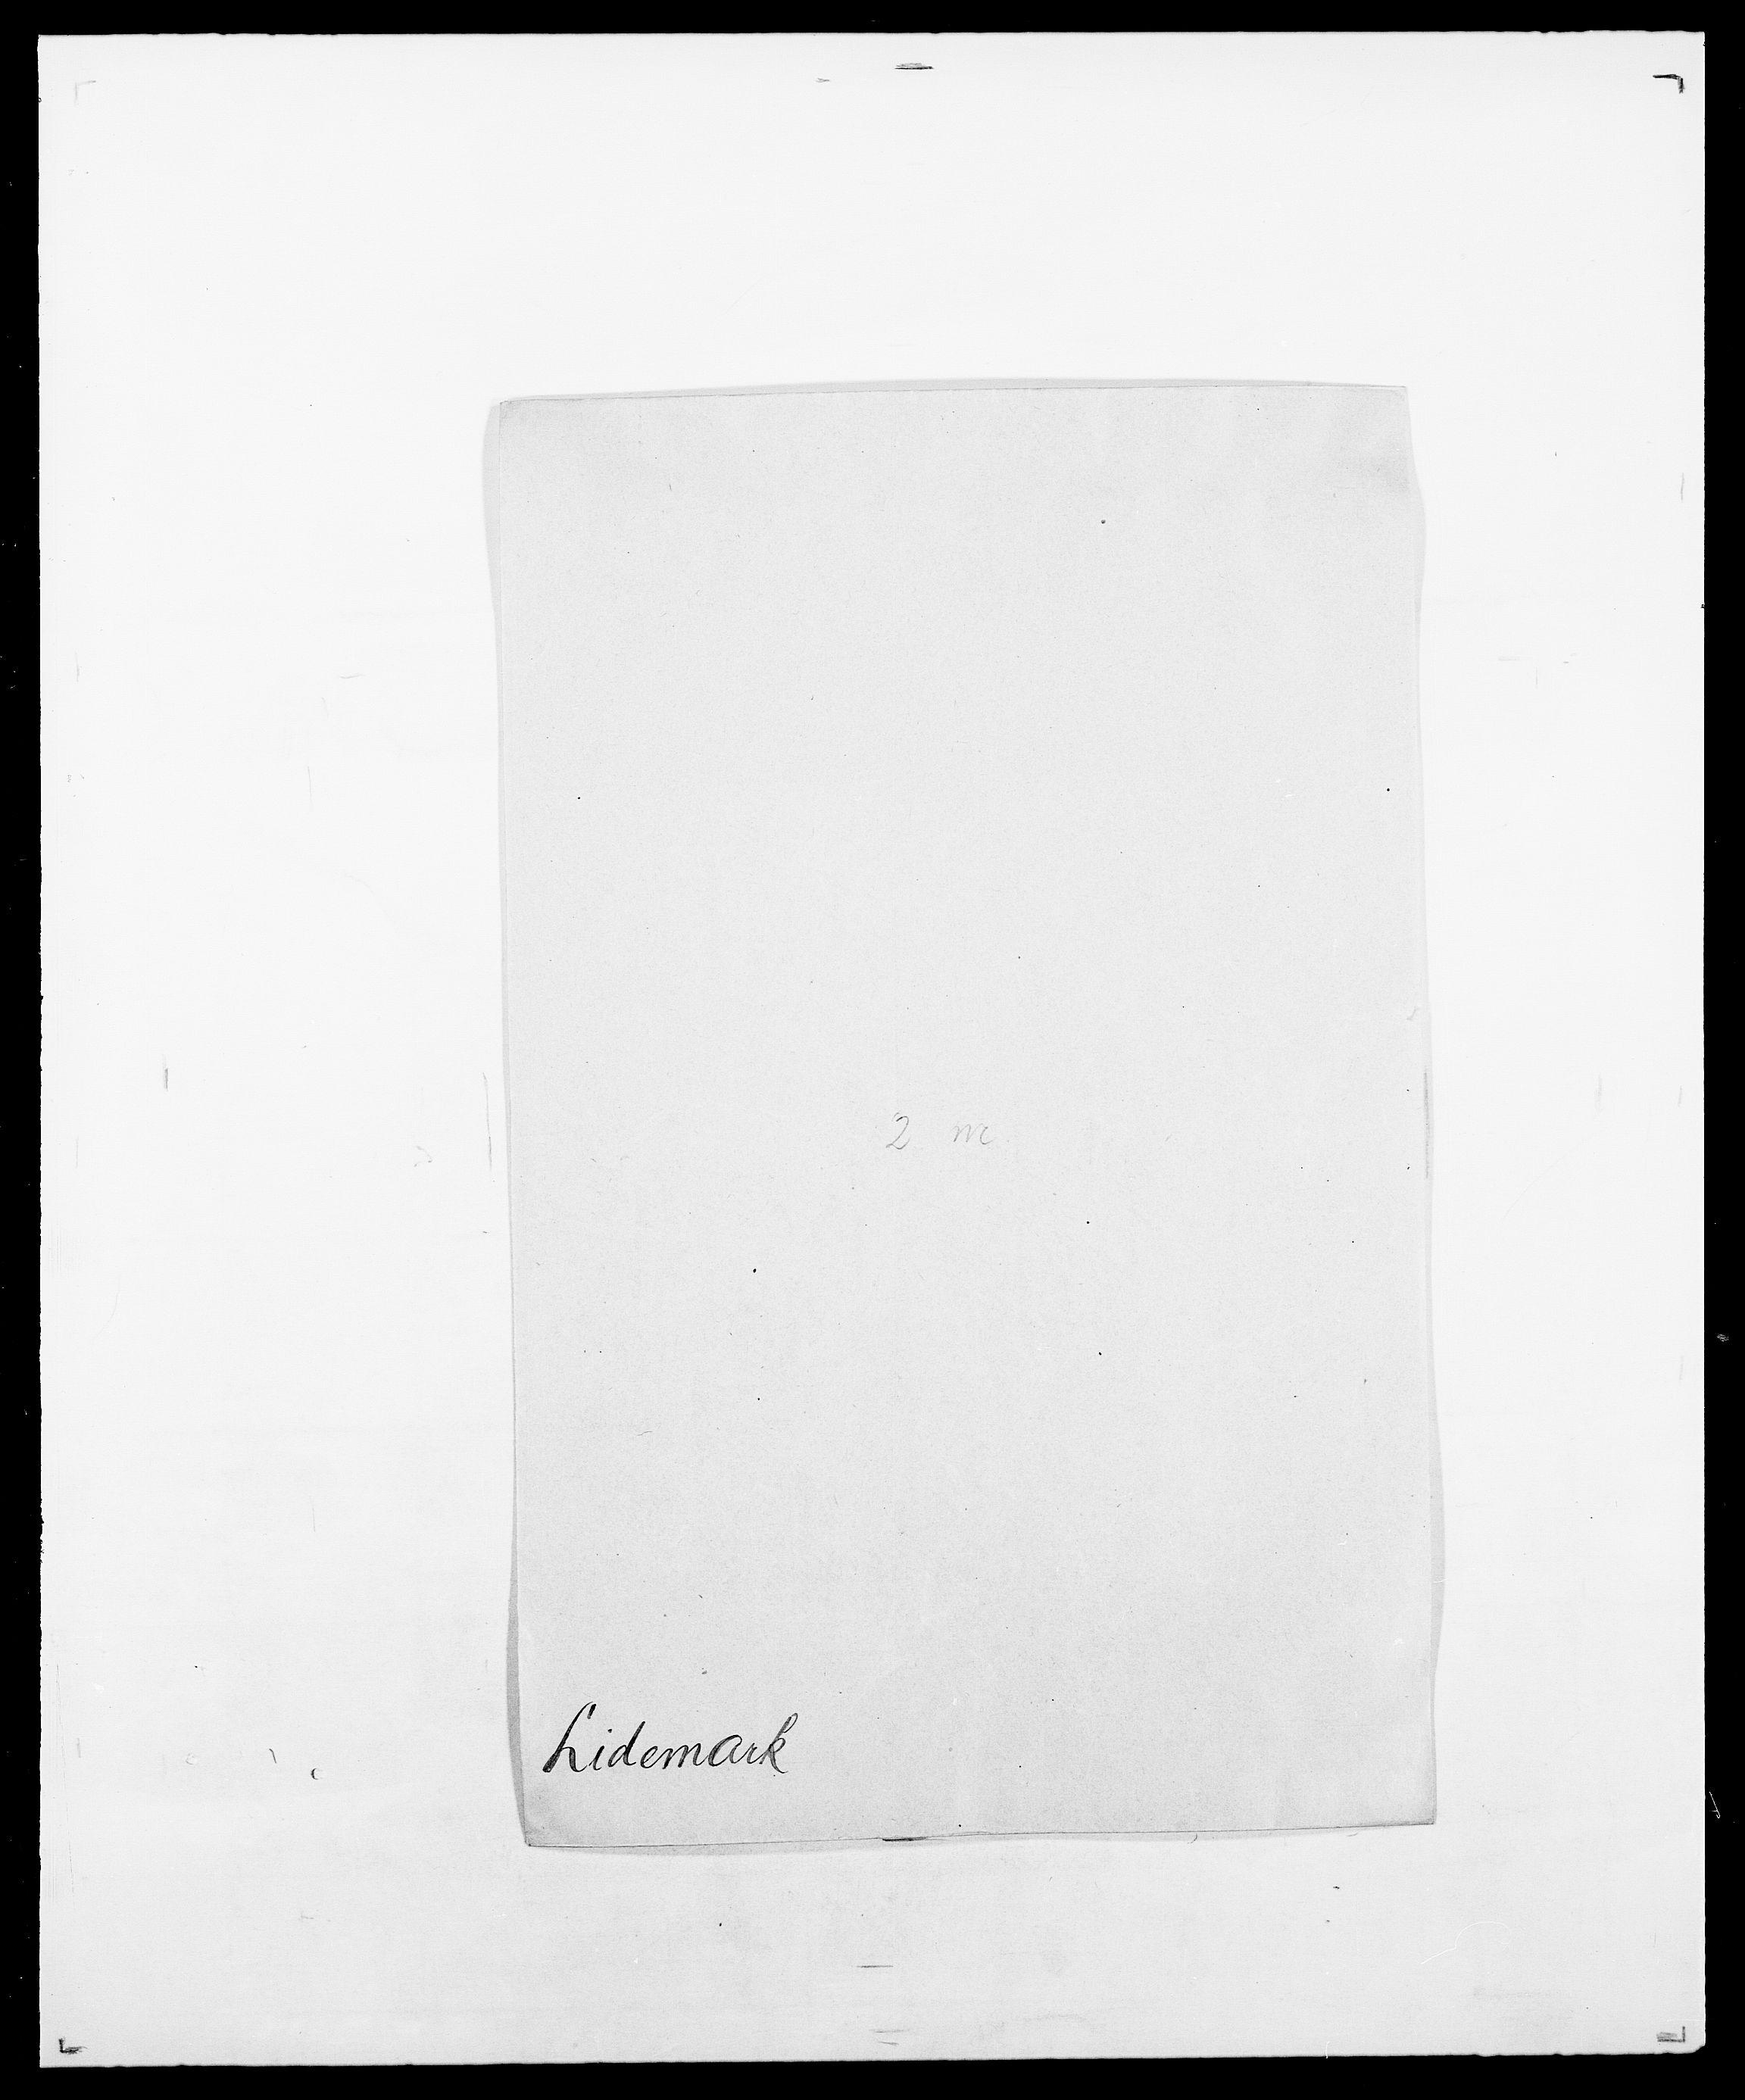 SAO, Delgobe, Charles Antoine - samling, D/Da/L0023: Lau - Lirvyn, s. 321